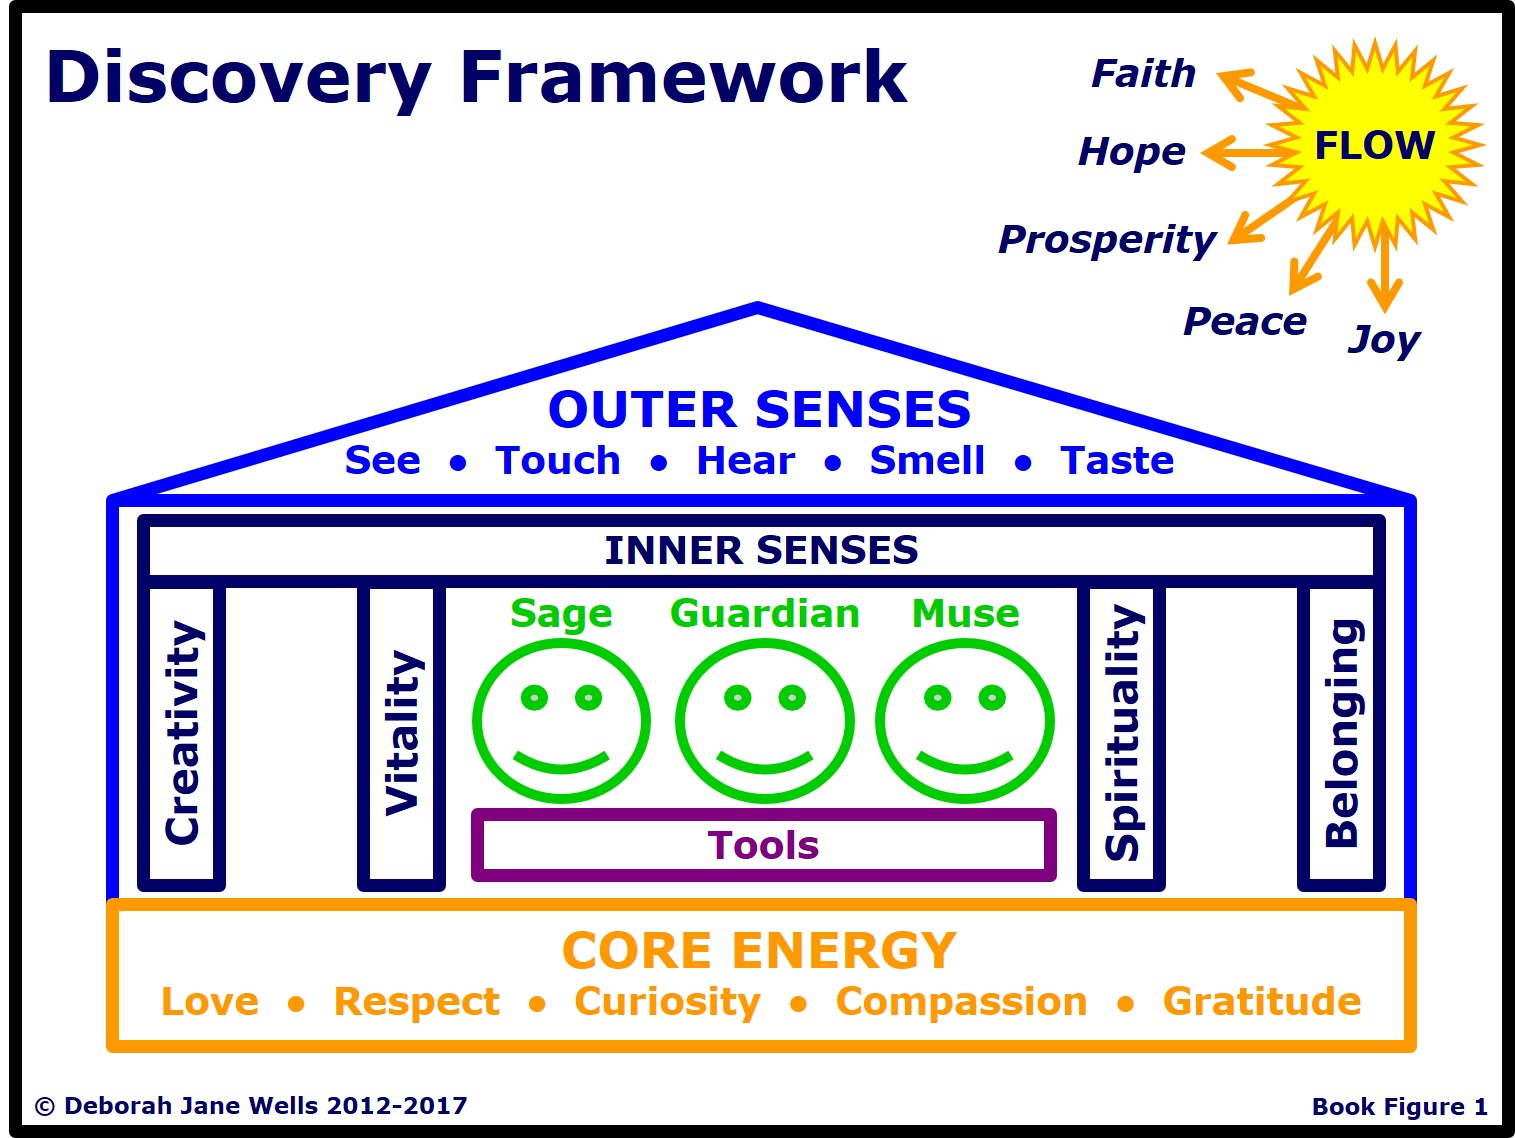 Figure 1 Discovery Framework